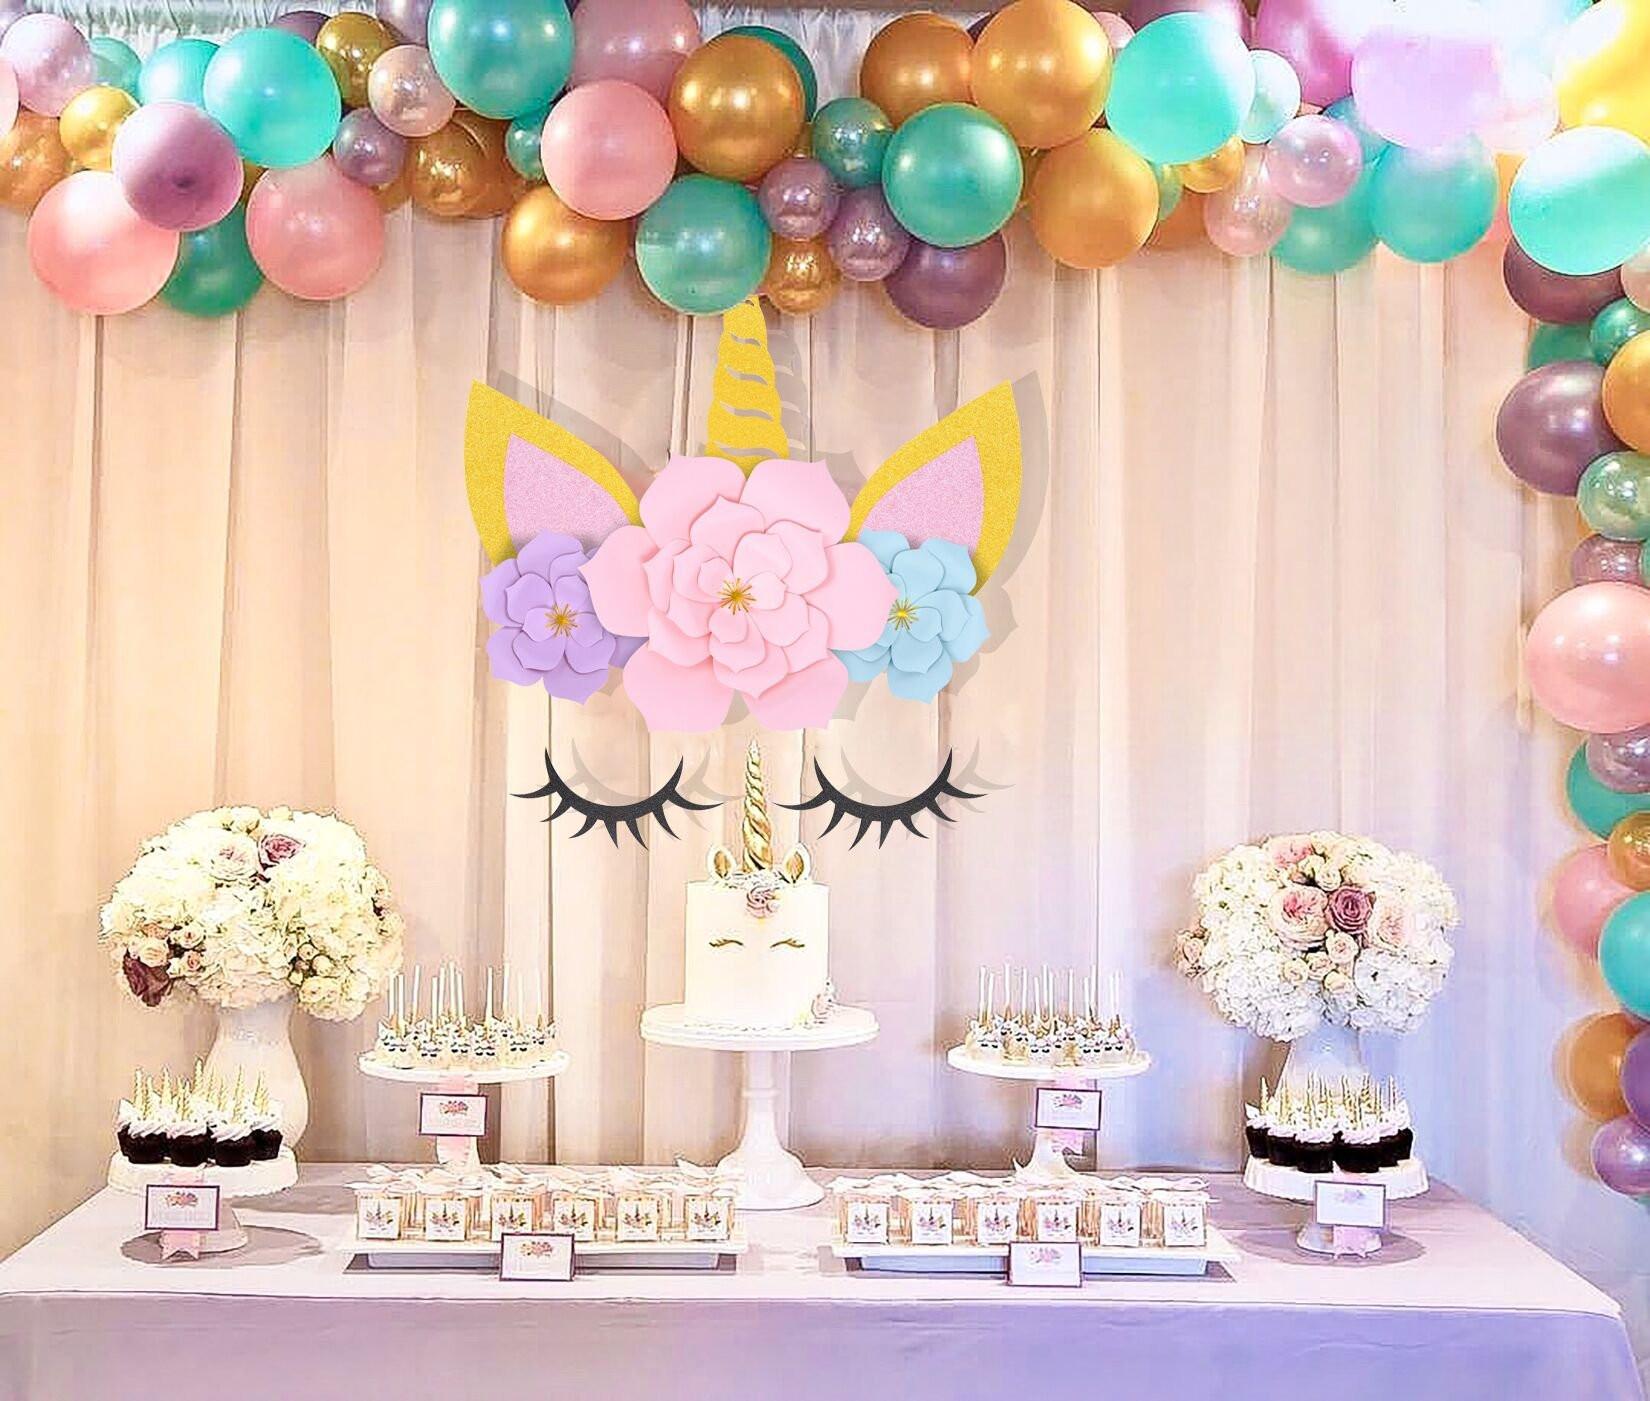 Unicorn Party Centerpiece Ideas  MORDUN Unicorn Party Supplies and Decorations Backdrop for